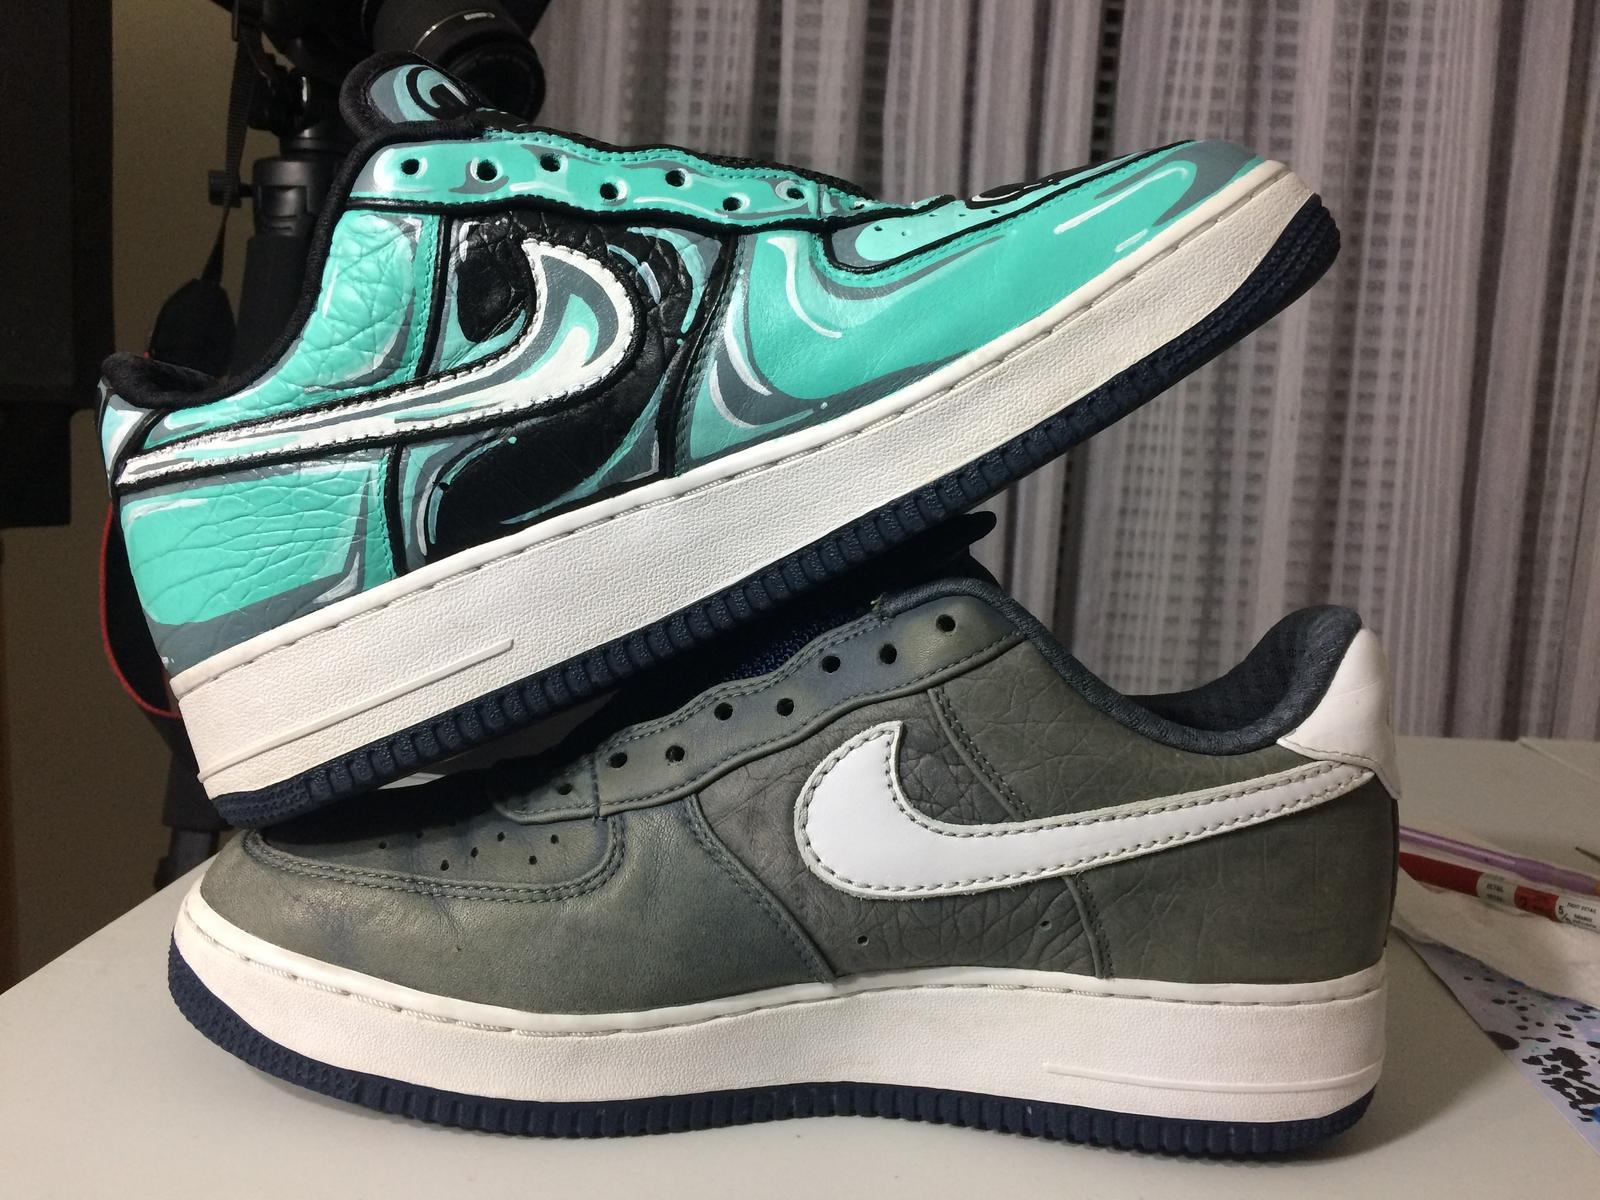 Sneaker Custom designs, themes